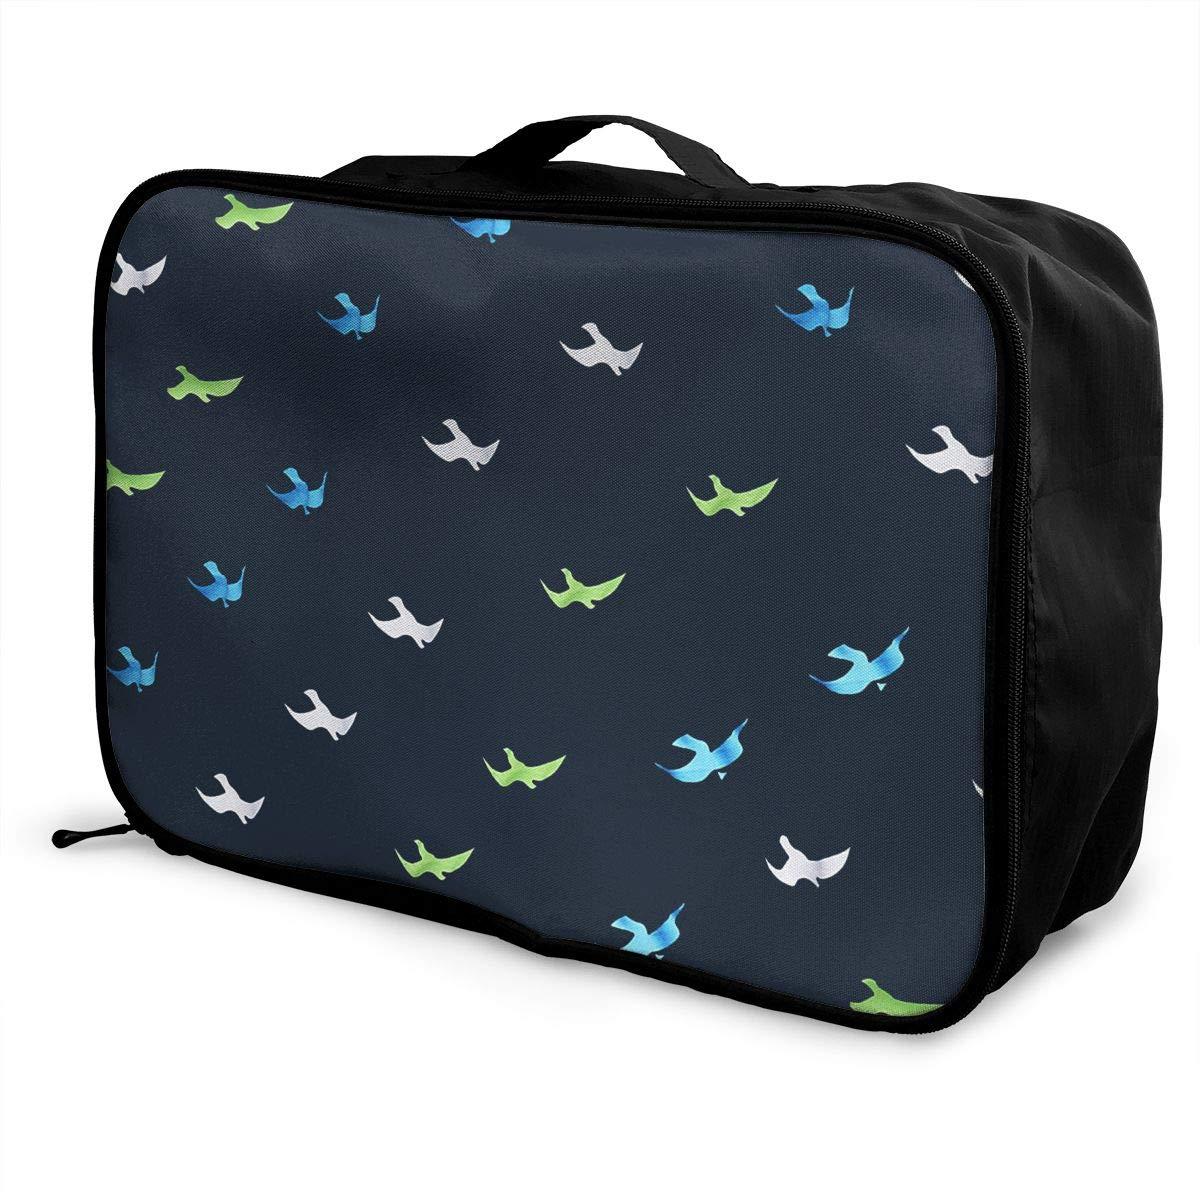 c399f14af553 Amazon.com: Seagull Travel Lightweight Large Capacity Portable ...